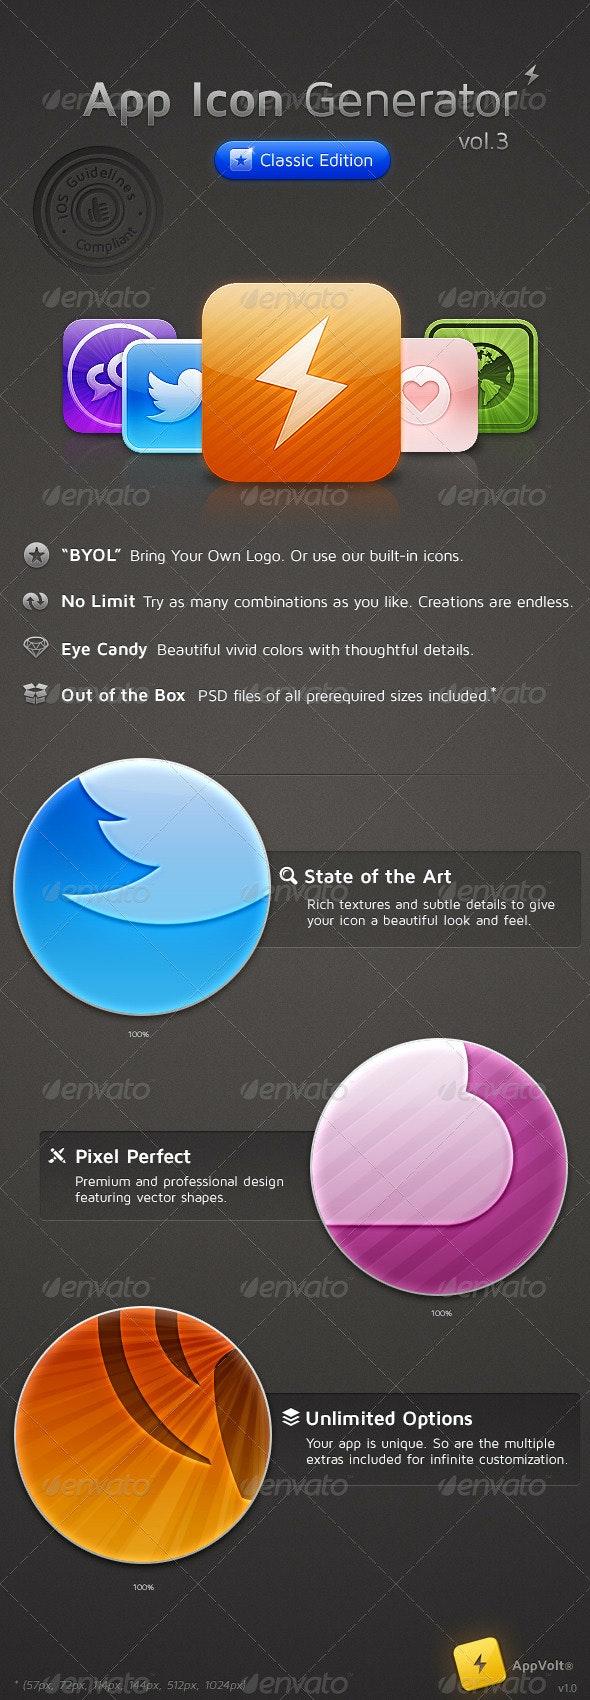 App Icon Generator Vol.3 - Software Icons